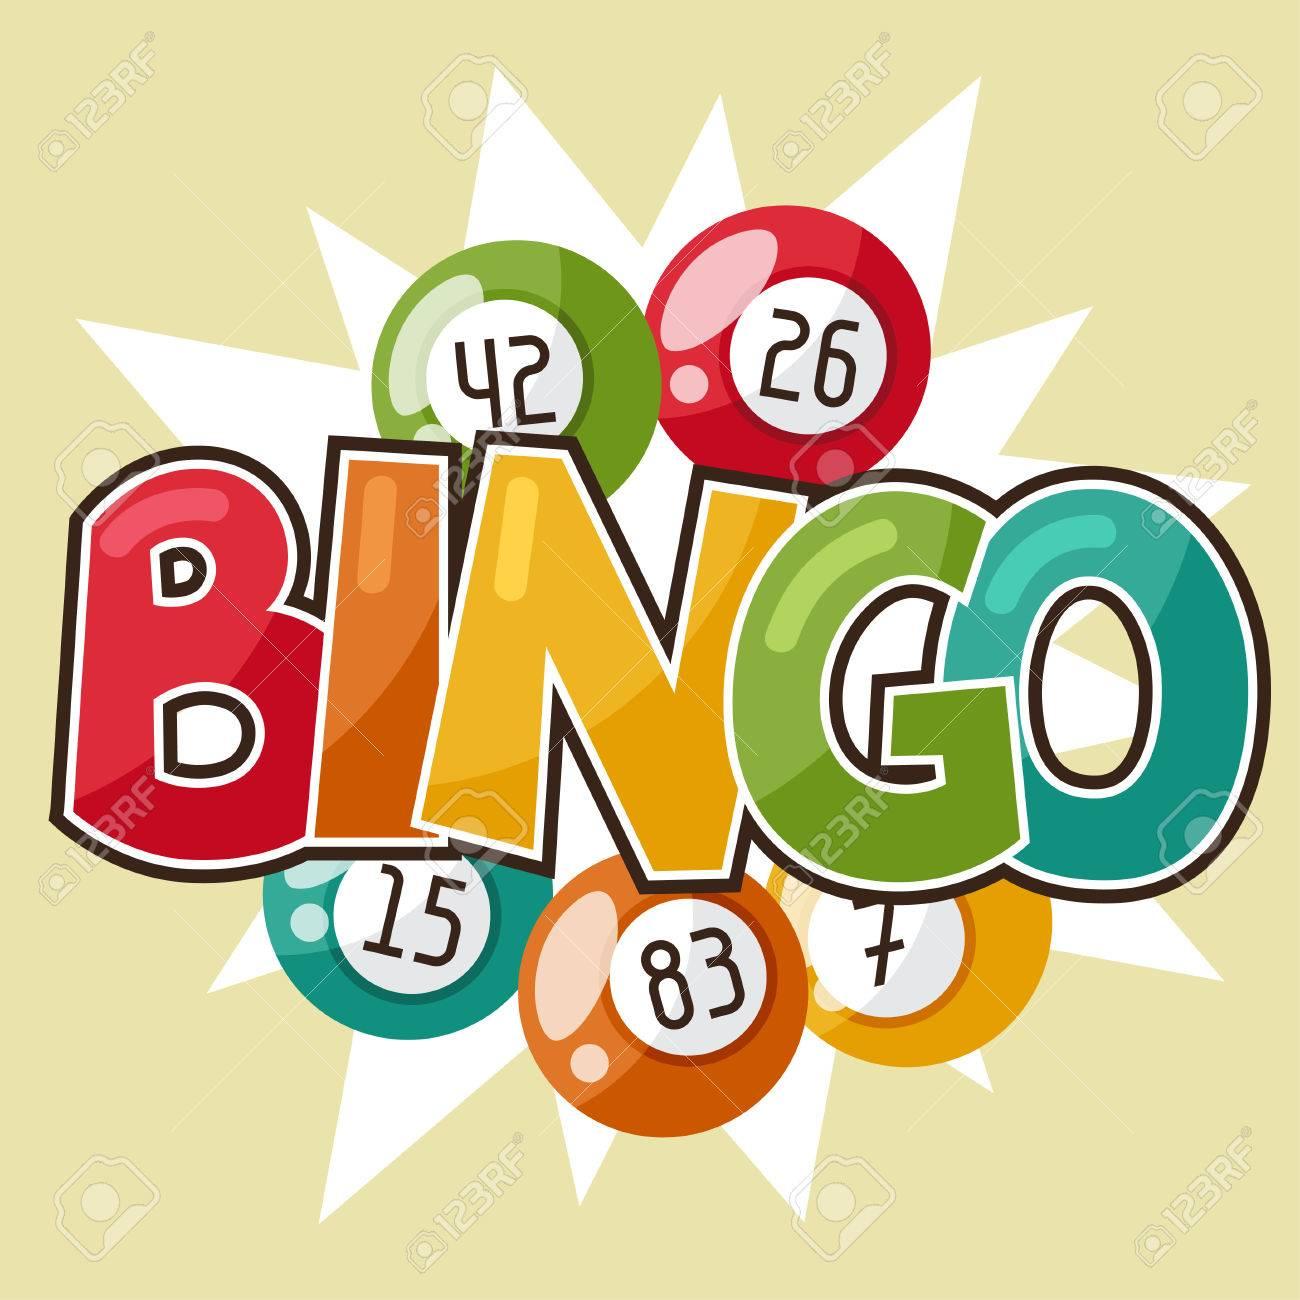 Bingo or lottery retro game illustration with balls. - 47864777